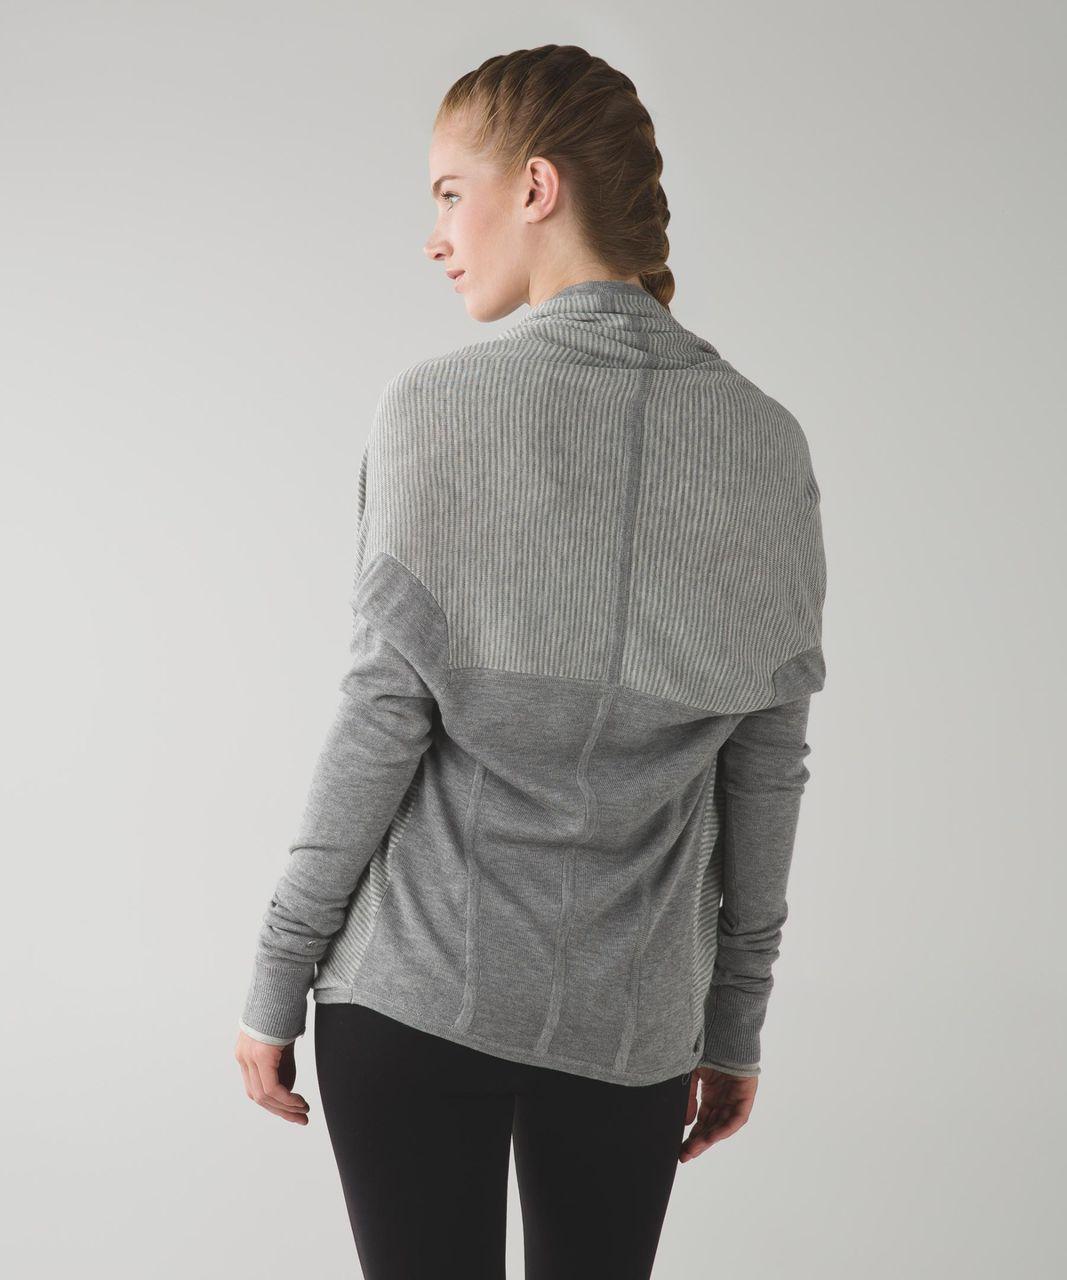 e2395a43a1 Lululemon Iconic Wrap - Heathered Medium Grey   Heathered Light Grey - lulu  fanatics